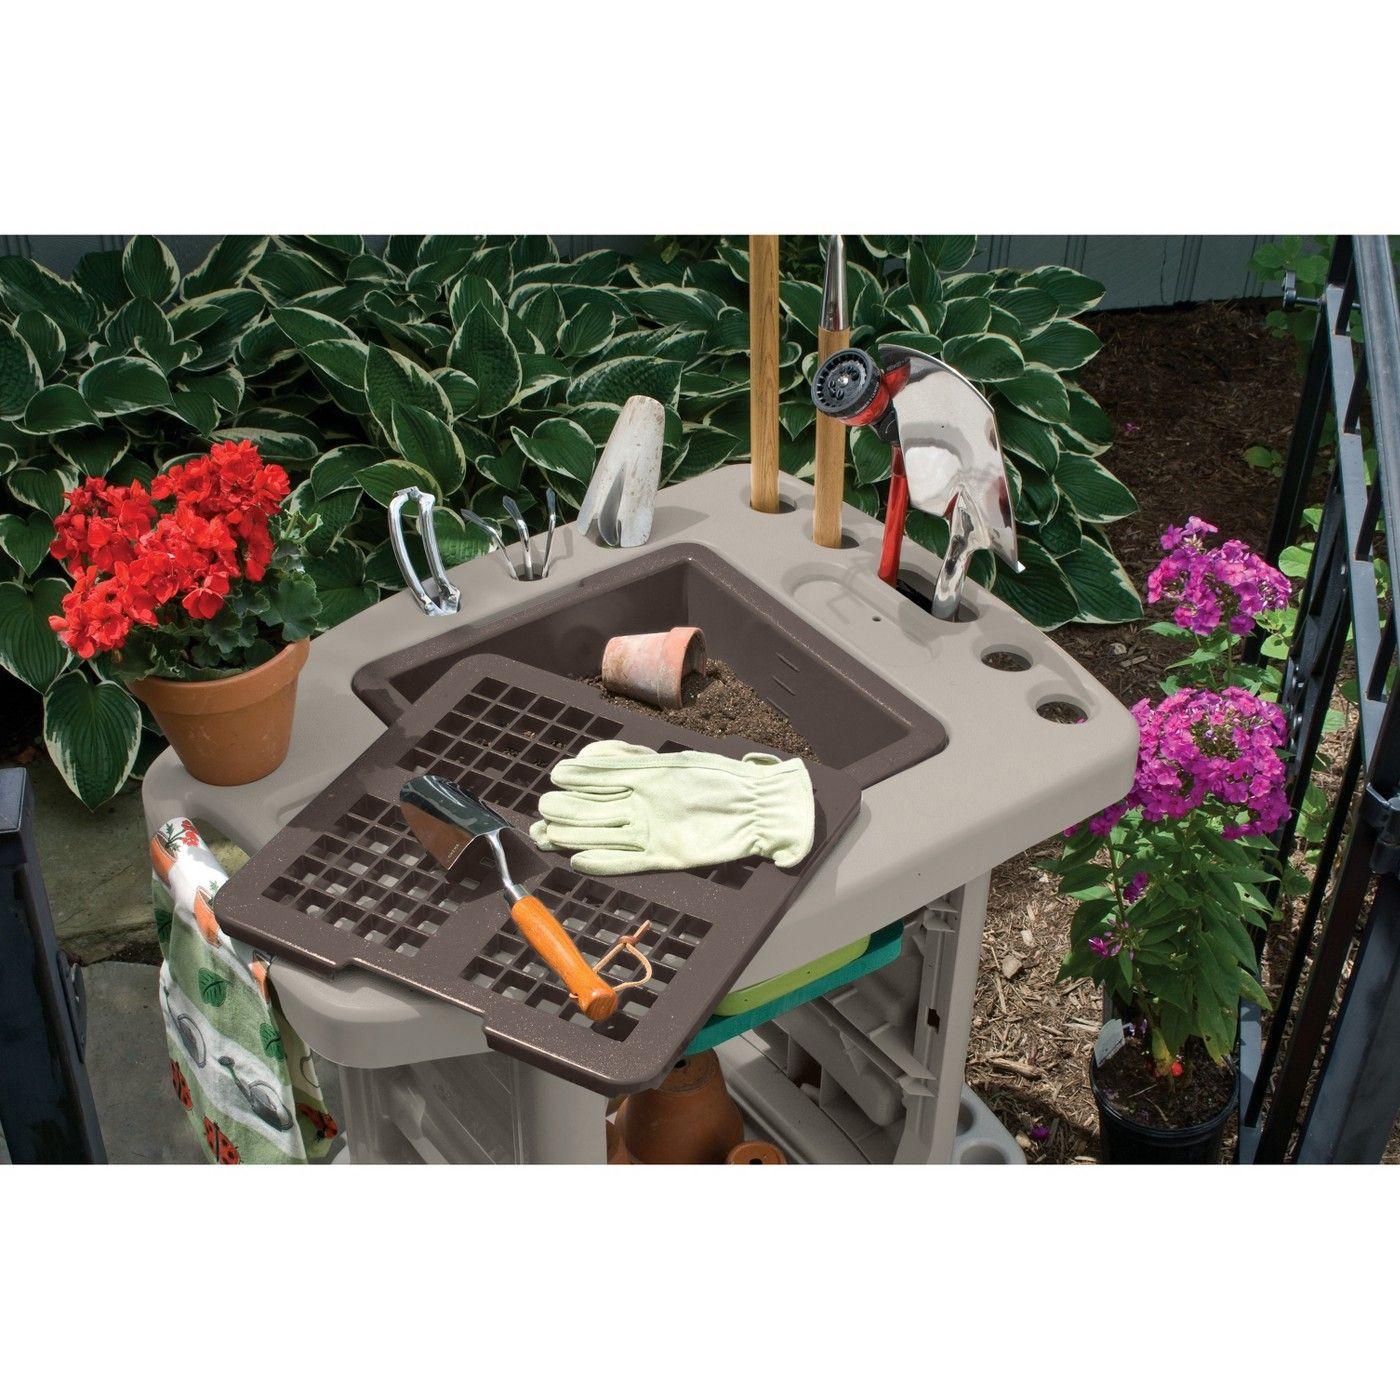 Resin Garden Center Garden Cart Taupe Brown Suncast Target Garden Cart Garden Station Potting Bench